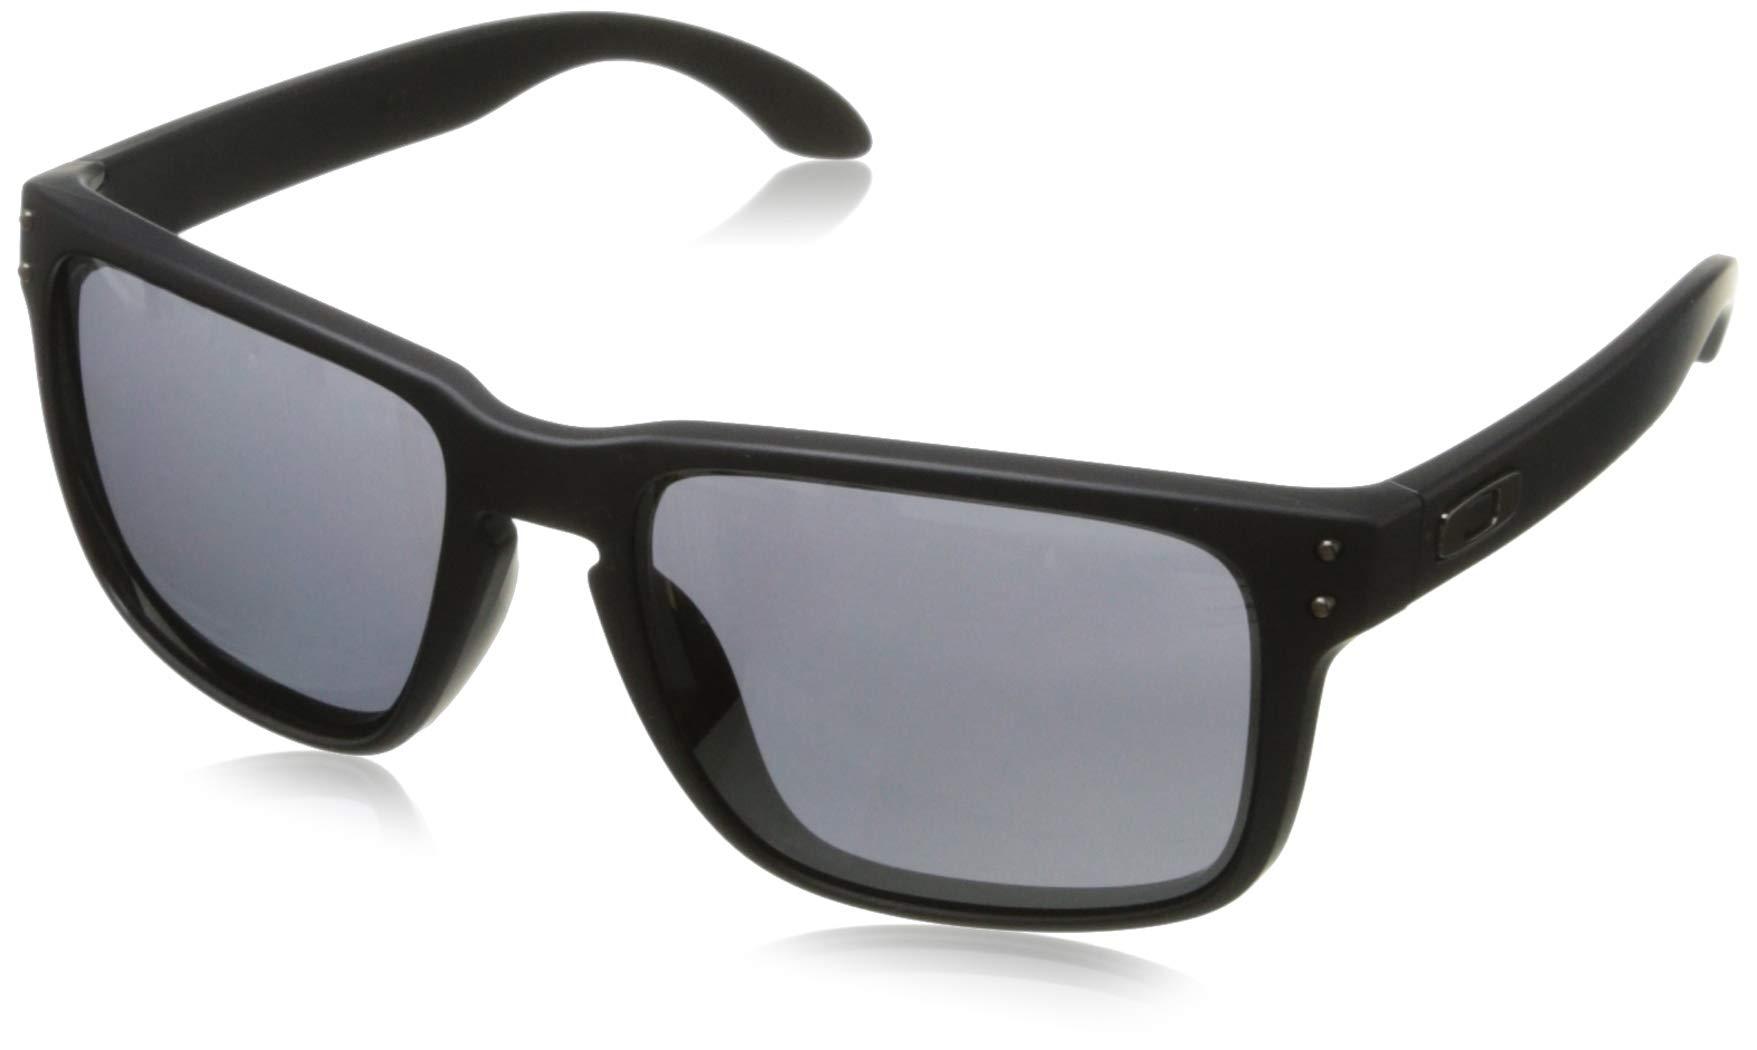 Oakley Men's Holbrook Non-Polarized Iridium Square Sunglasses, MATTE BLACK, 57 mm